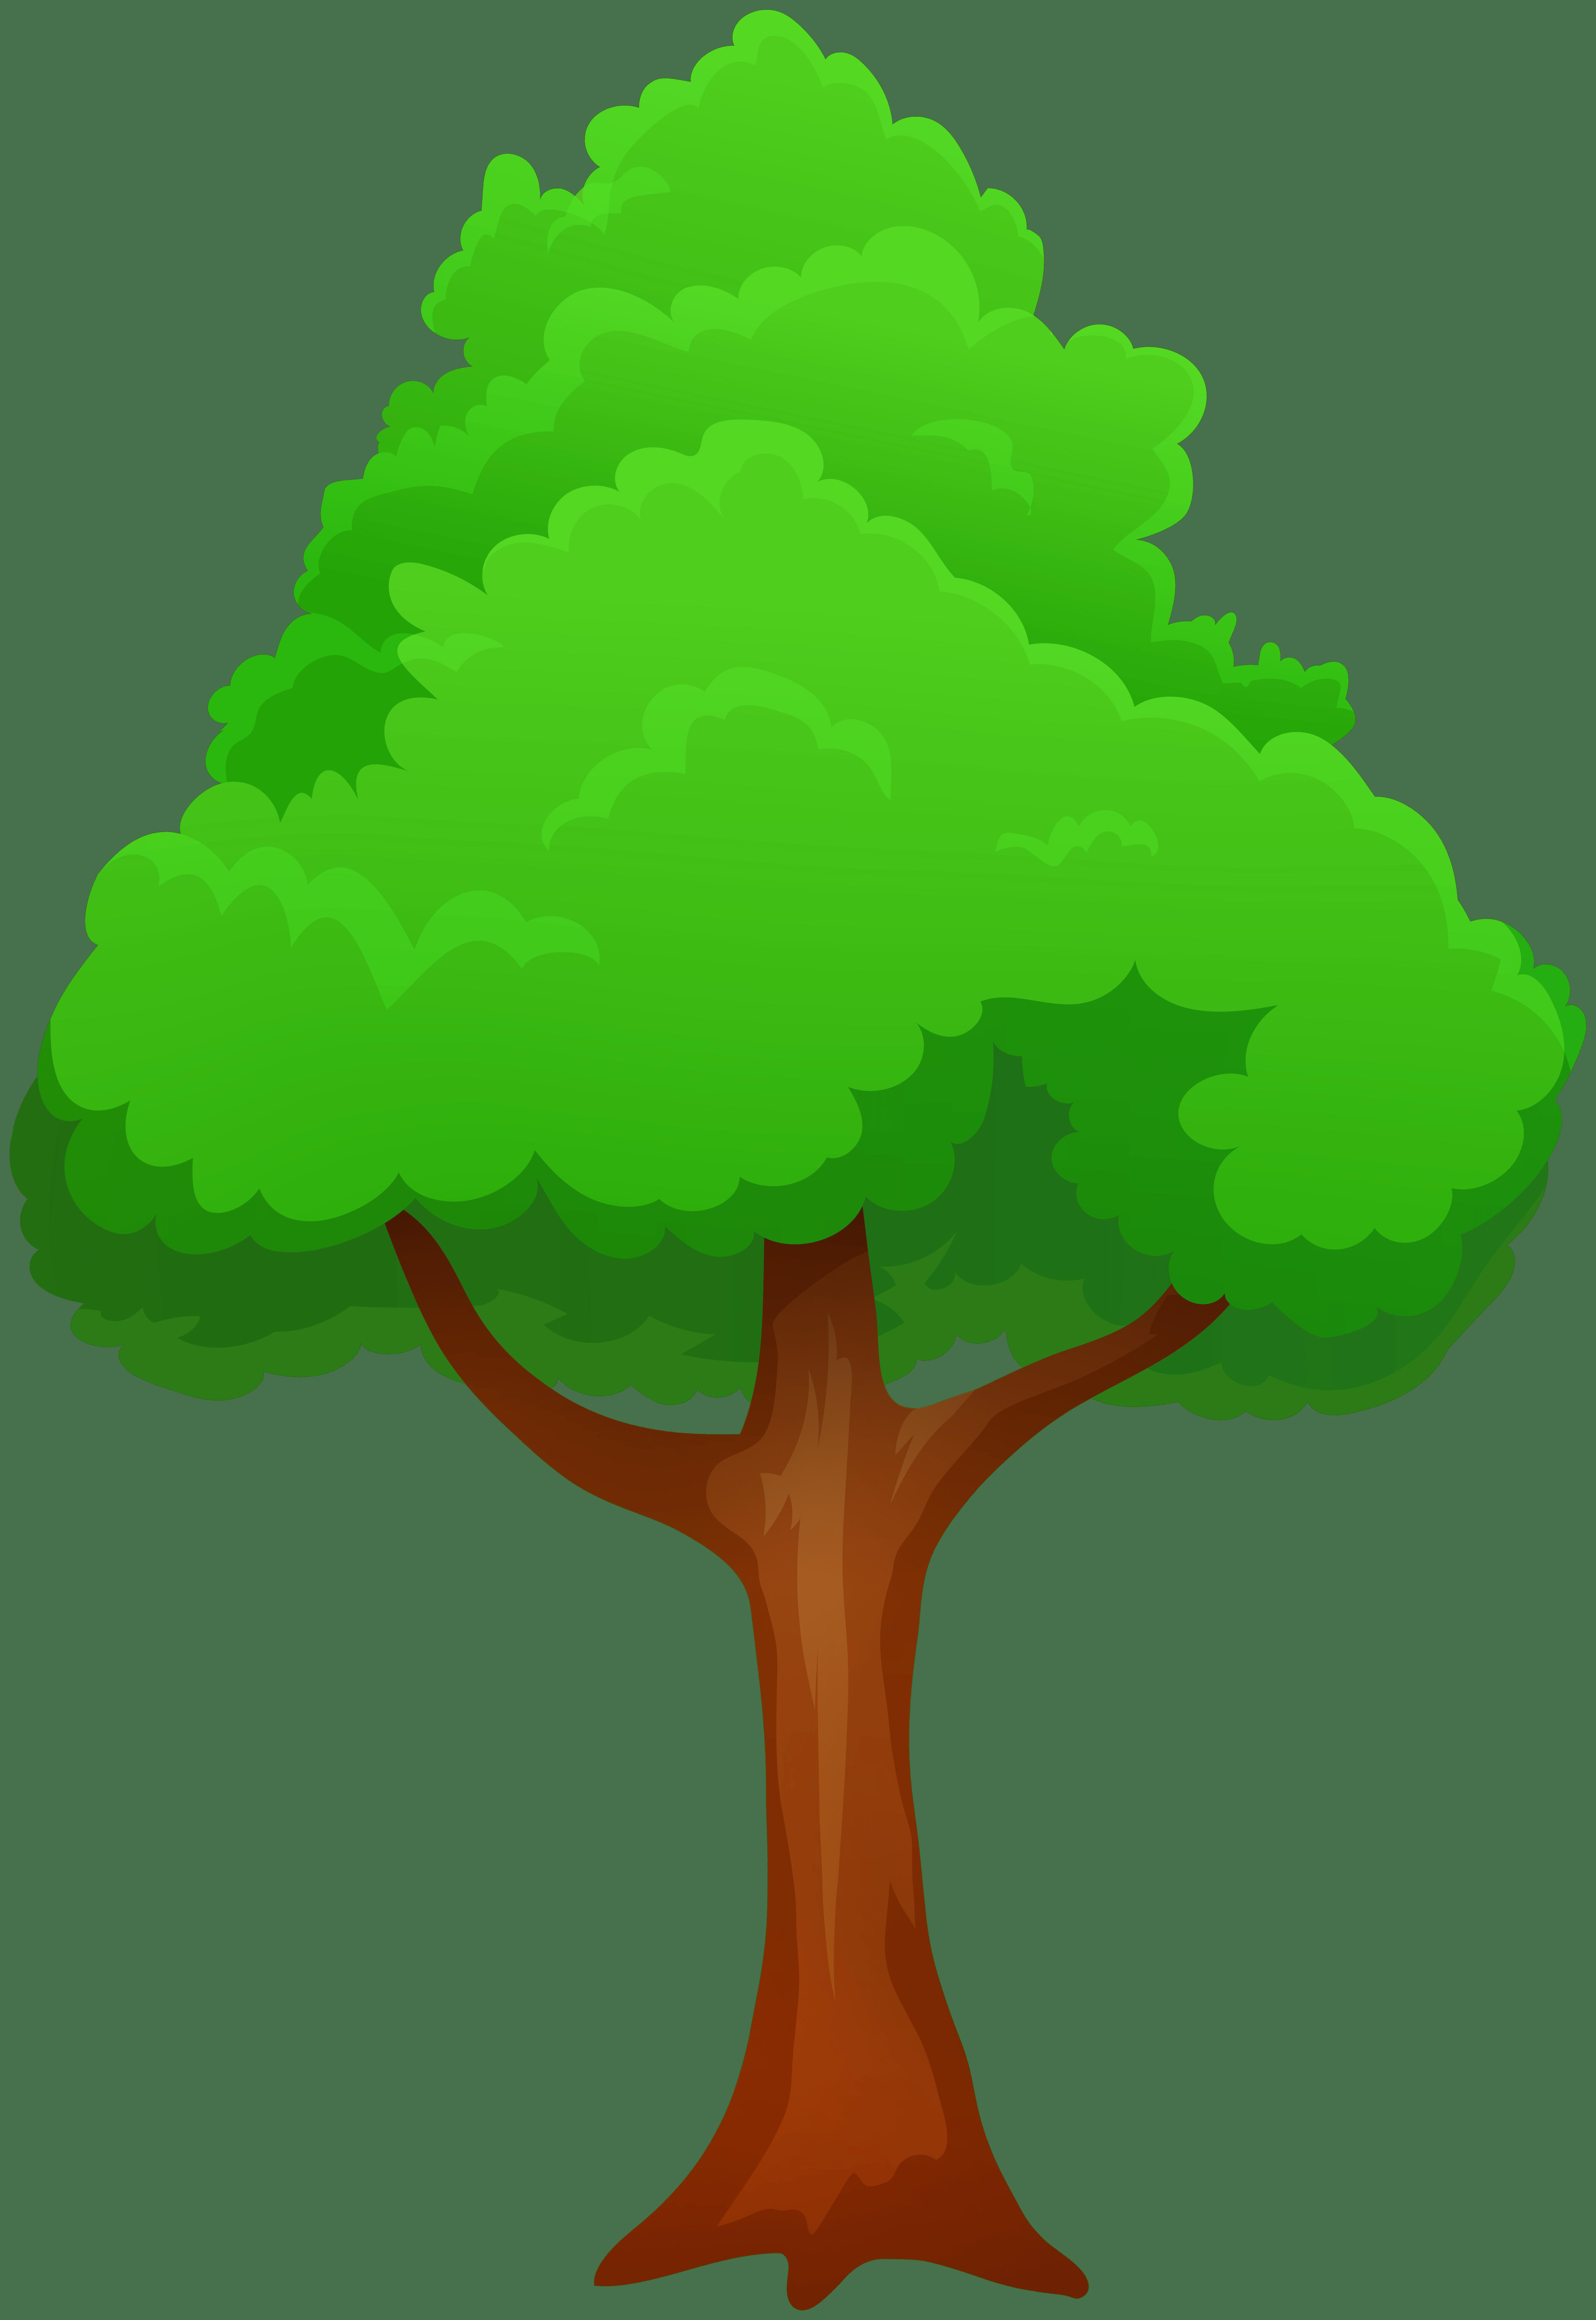 Vector graphics Drawing Clip art Image Cartoon - tree png ... (5505 x 8000 Pixel)